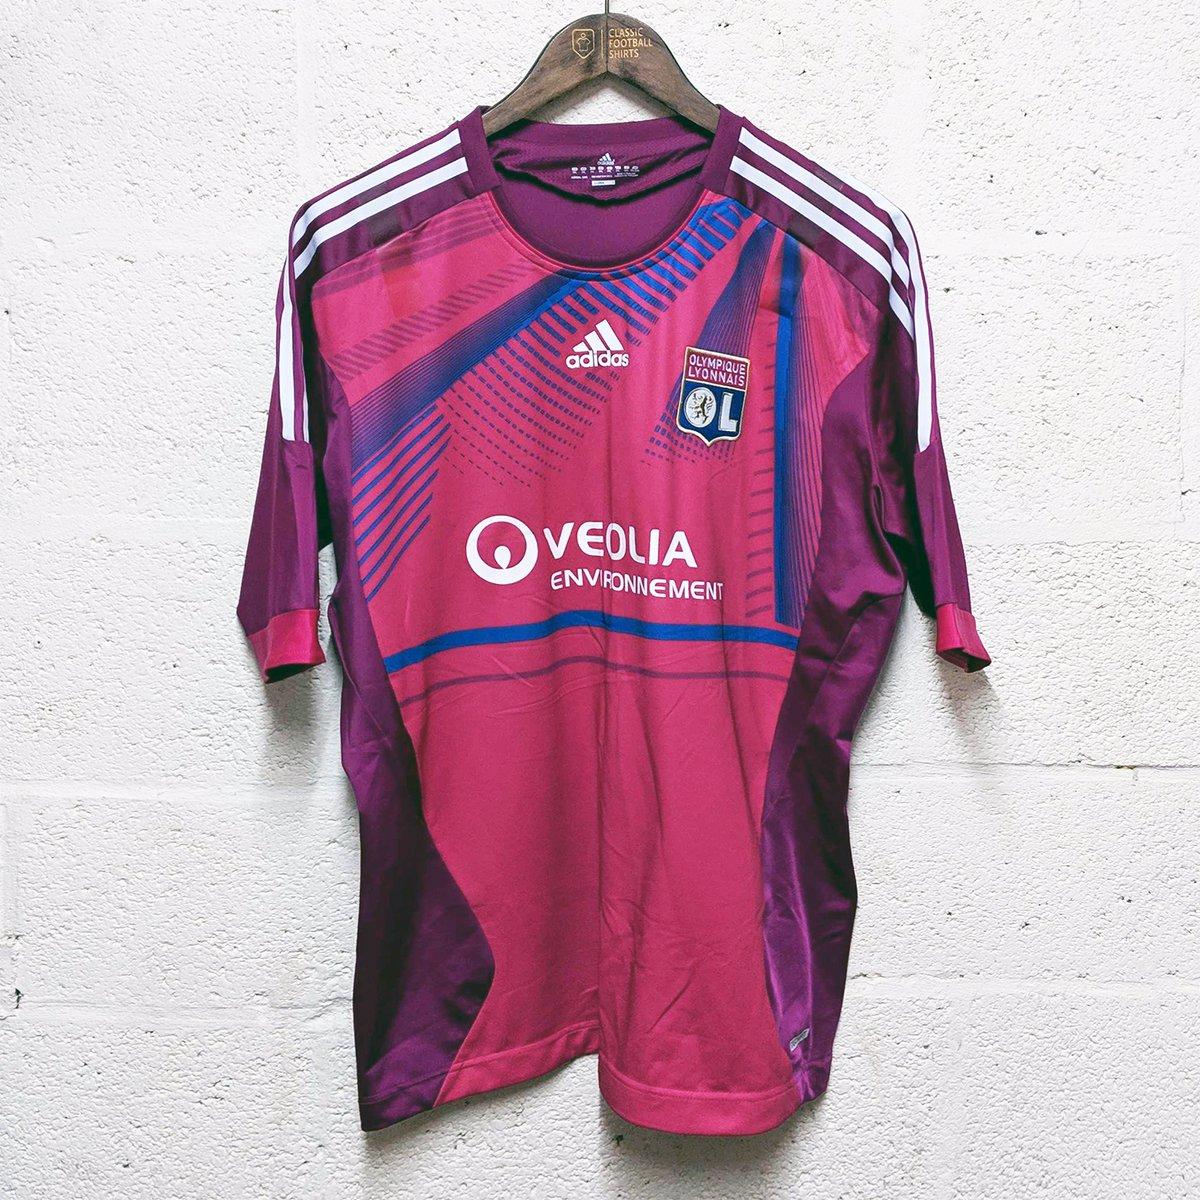 online store ed01f 2e09b Chelsea Football Shirt 2012 13 | Azərbaycan Dillər Universiteti